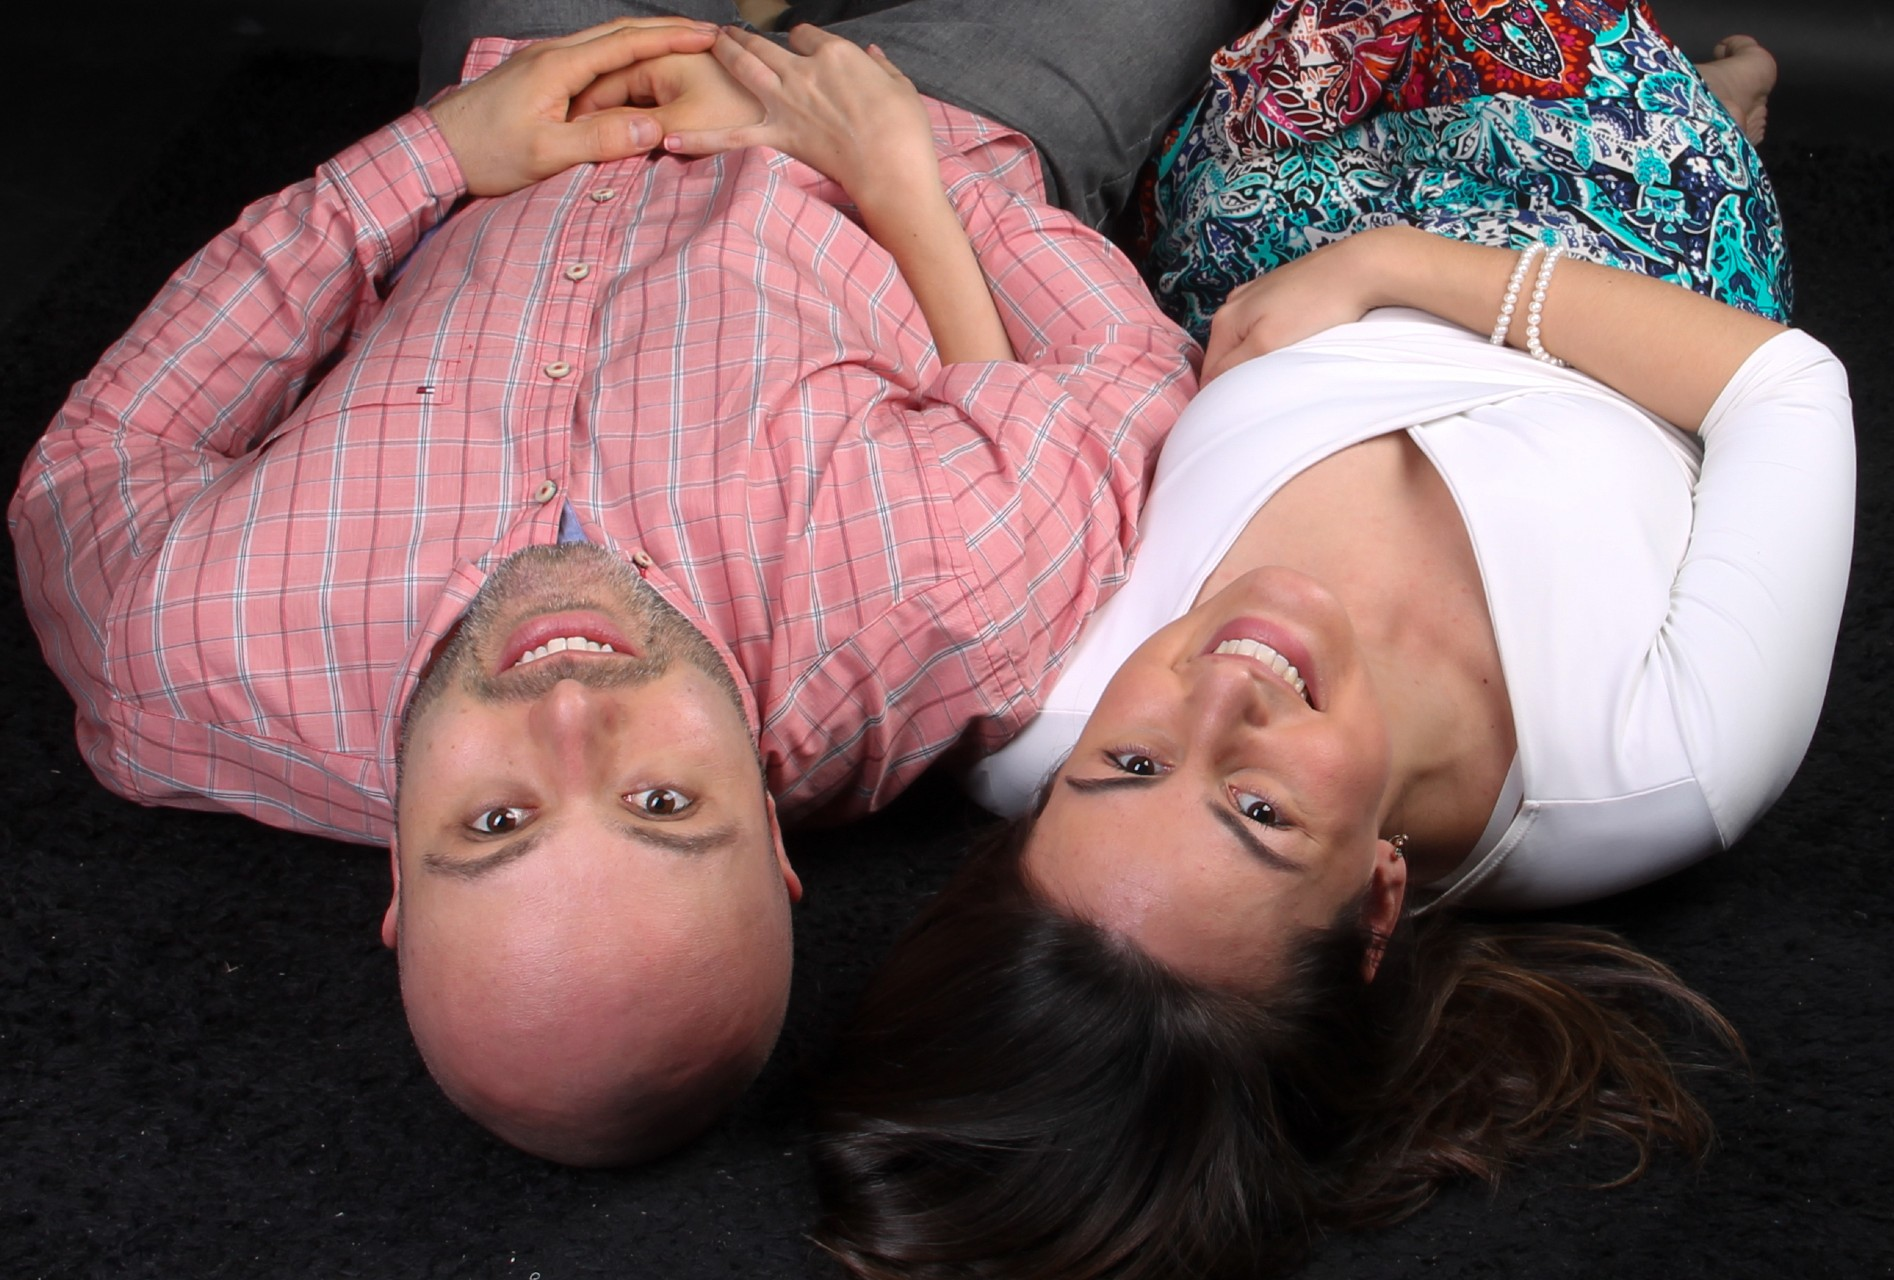 Richard Cunha Schmidt and his wife